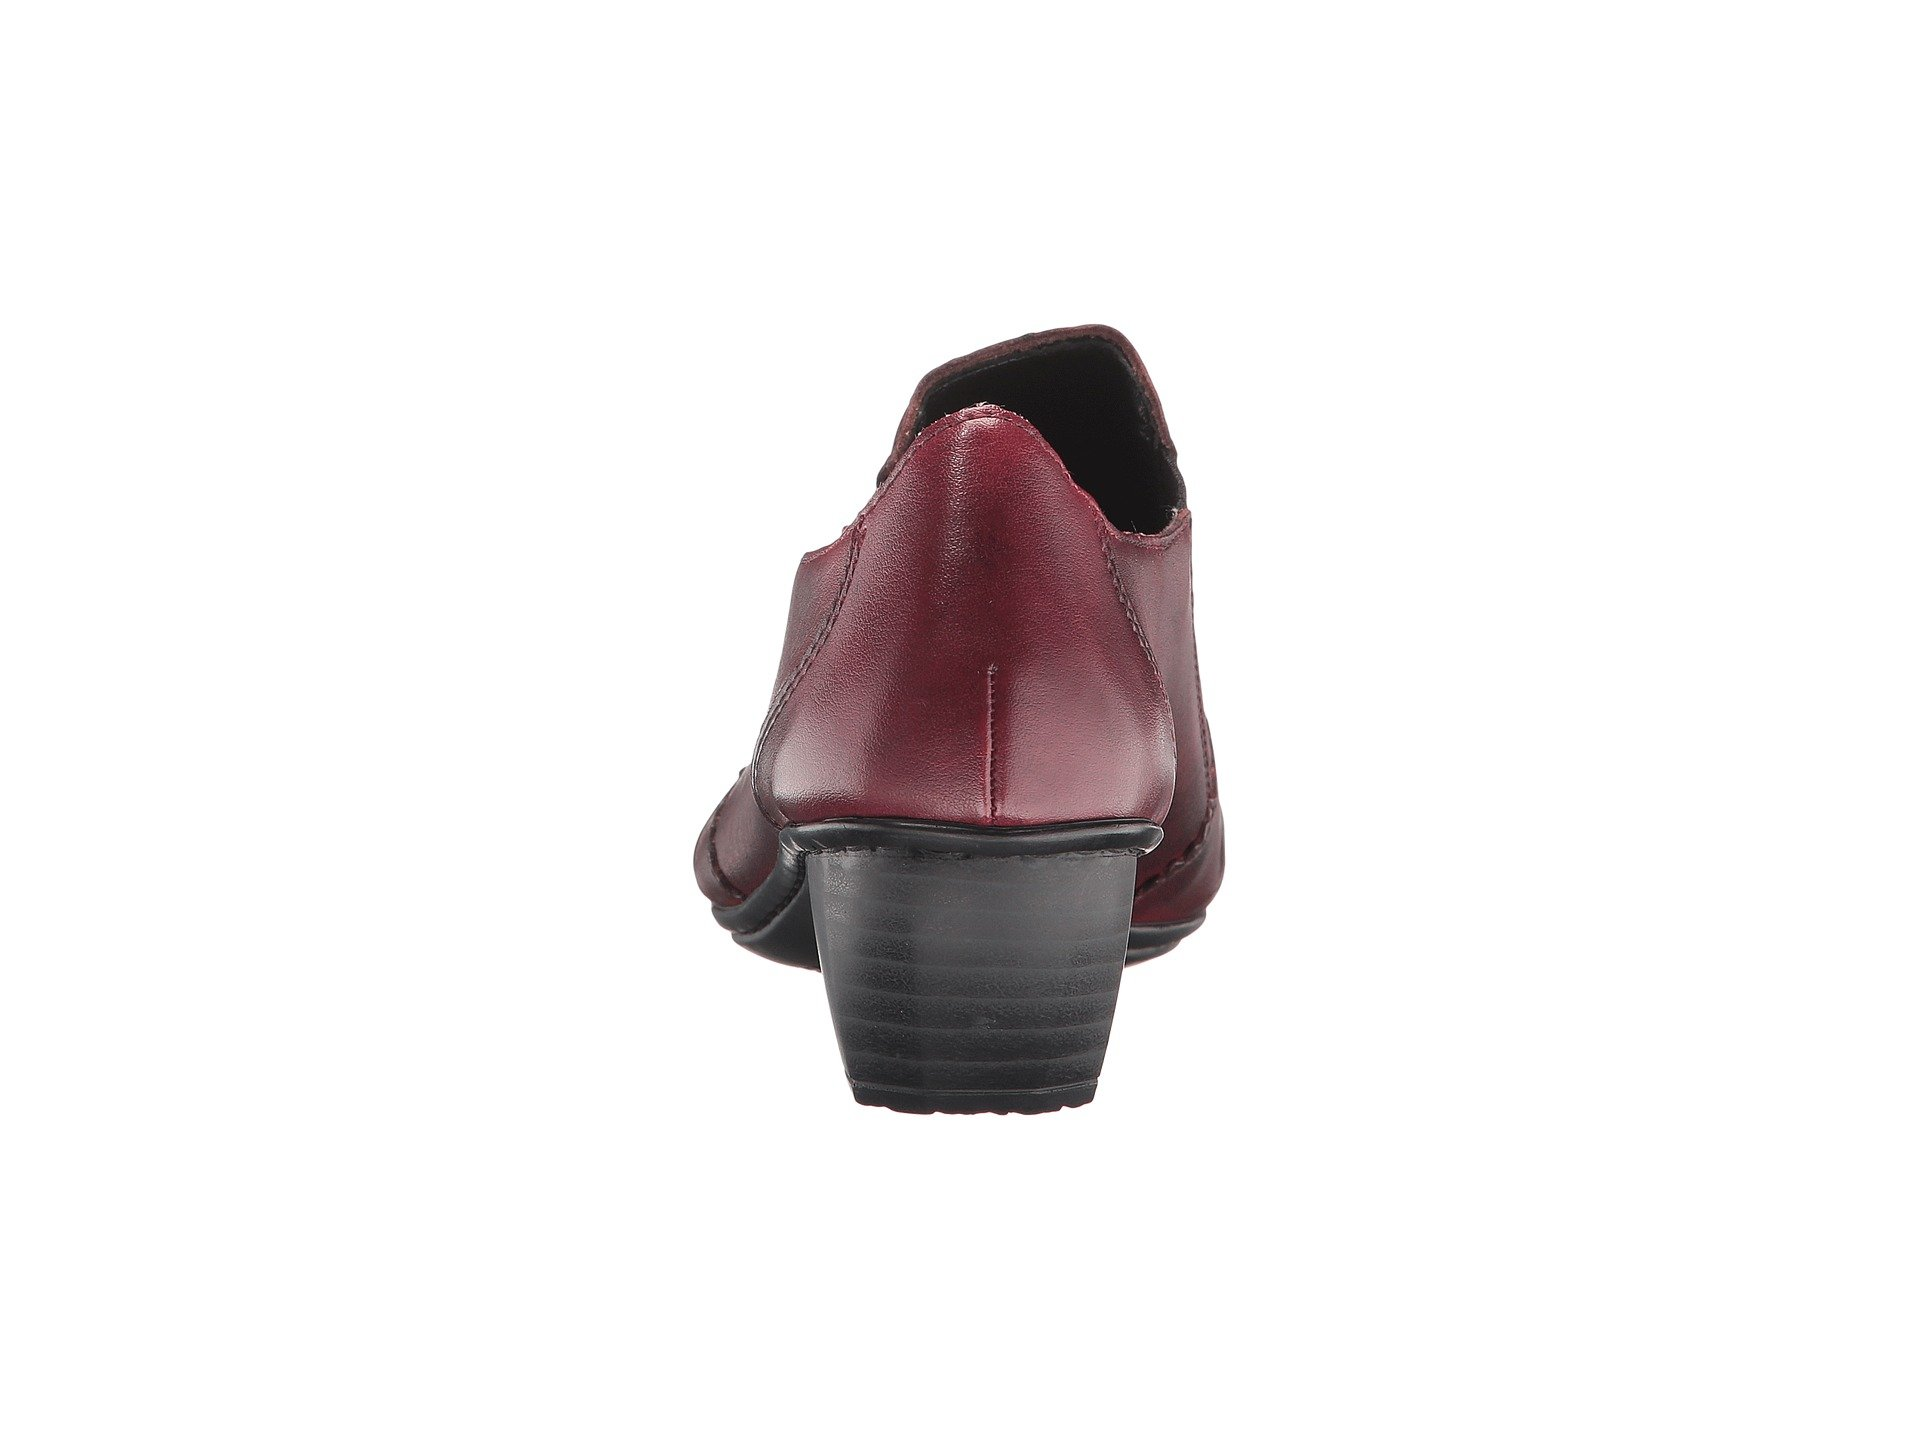 Medoc Cristallino bogota 41730 burgund Rieker q0w5T5